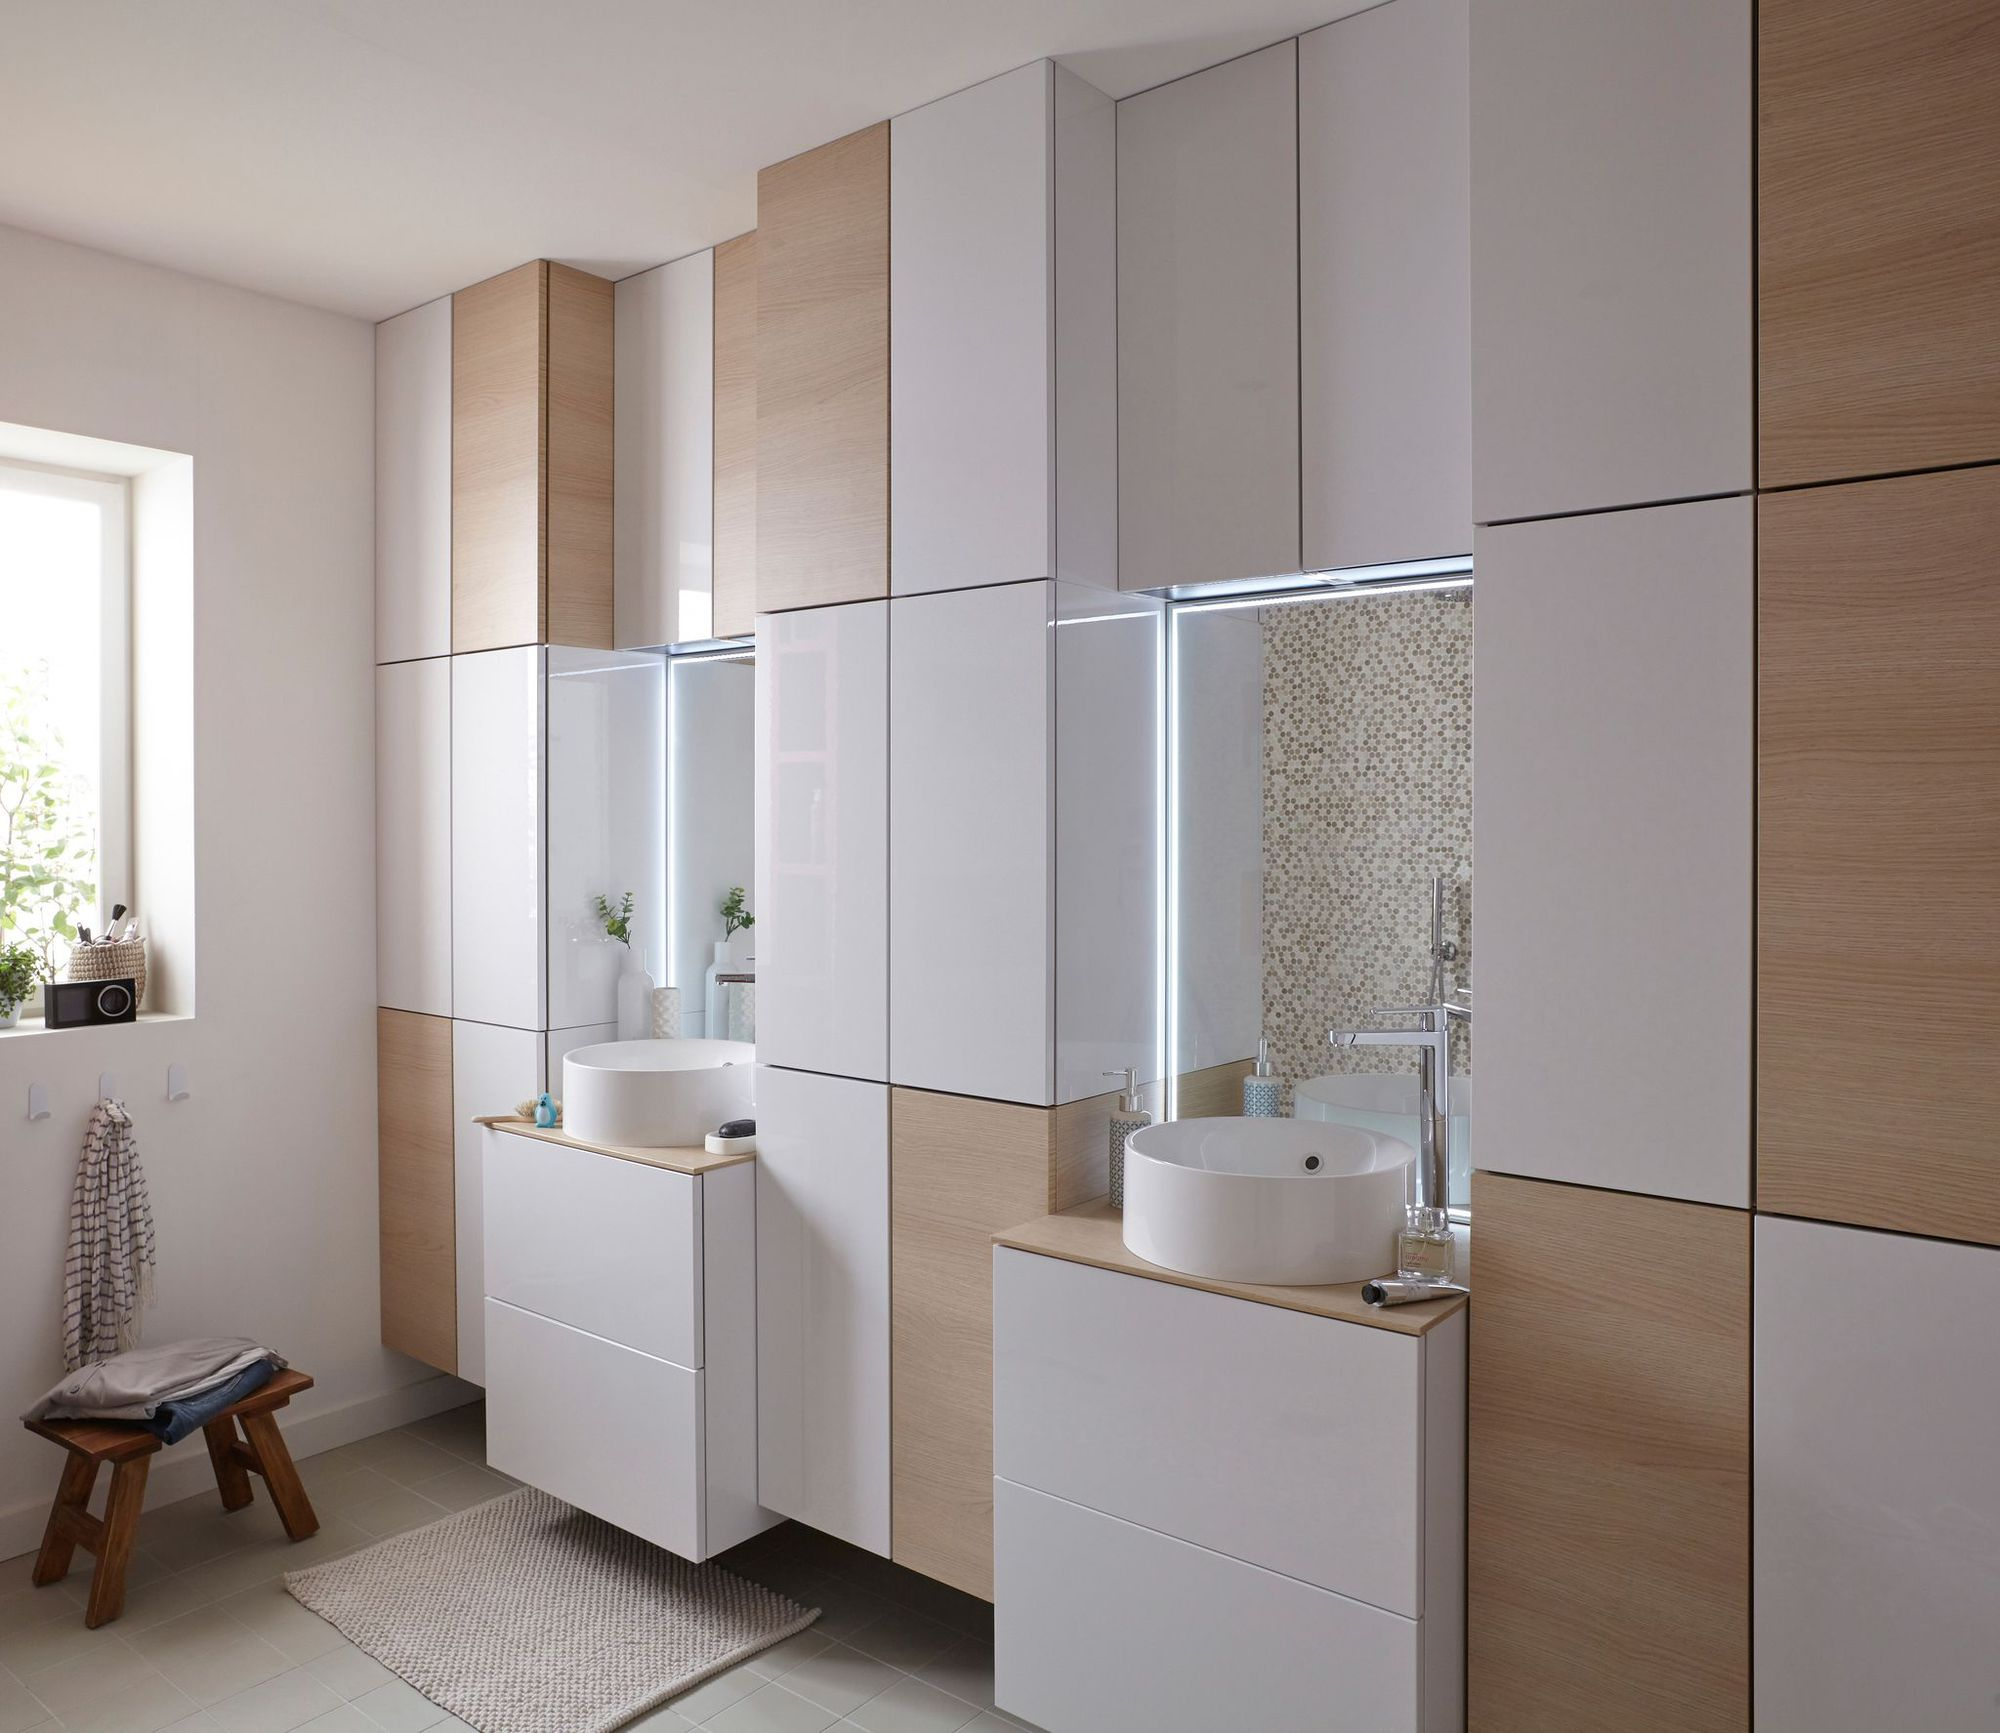 Double vasque for Mur salle de bain leroy merlin